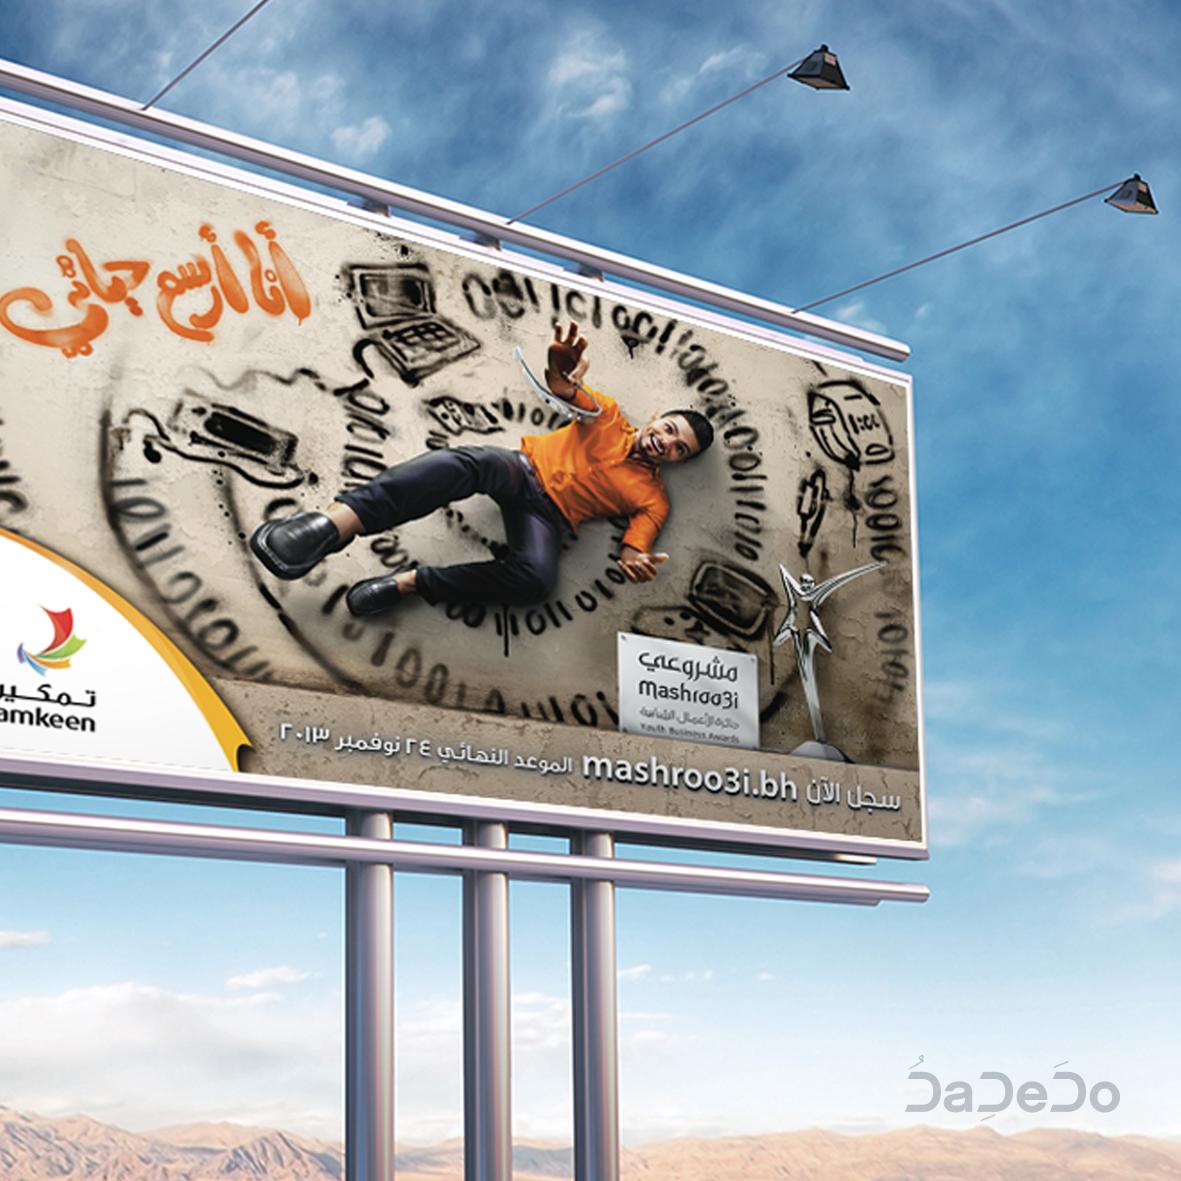 Mashroo3i Business Plan Competition Campaign